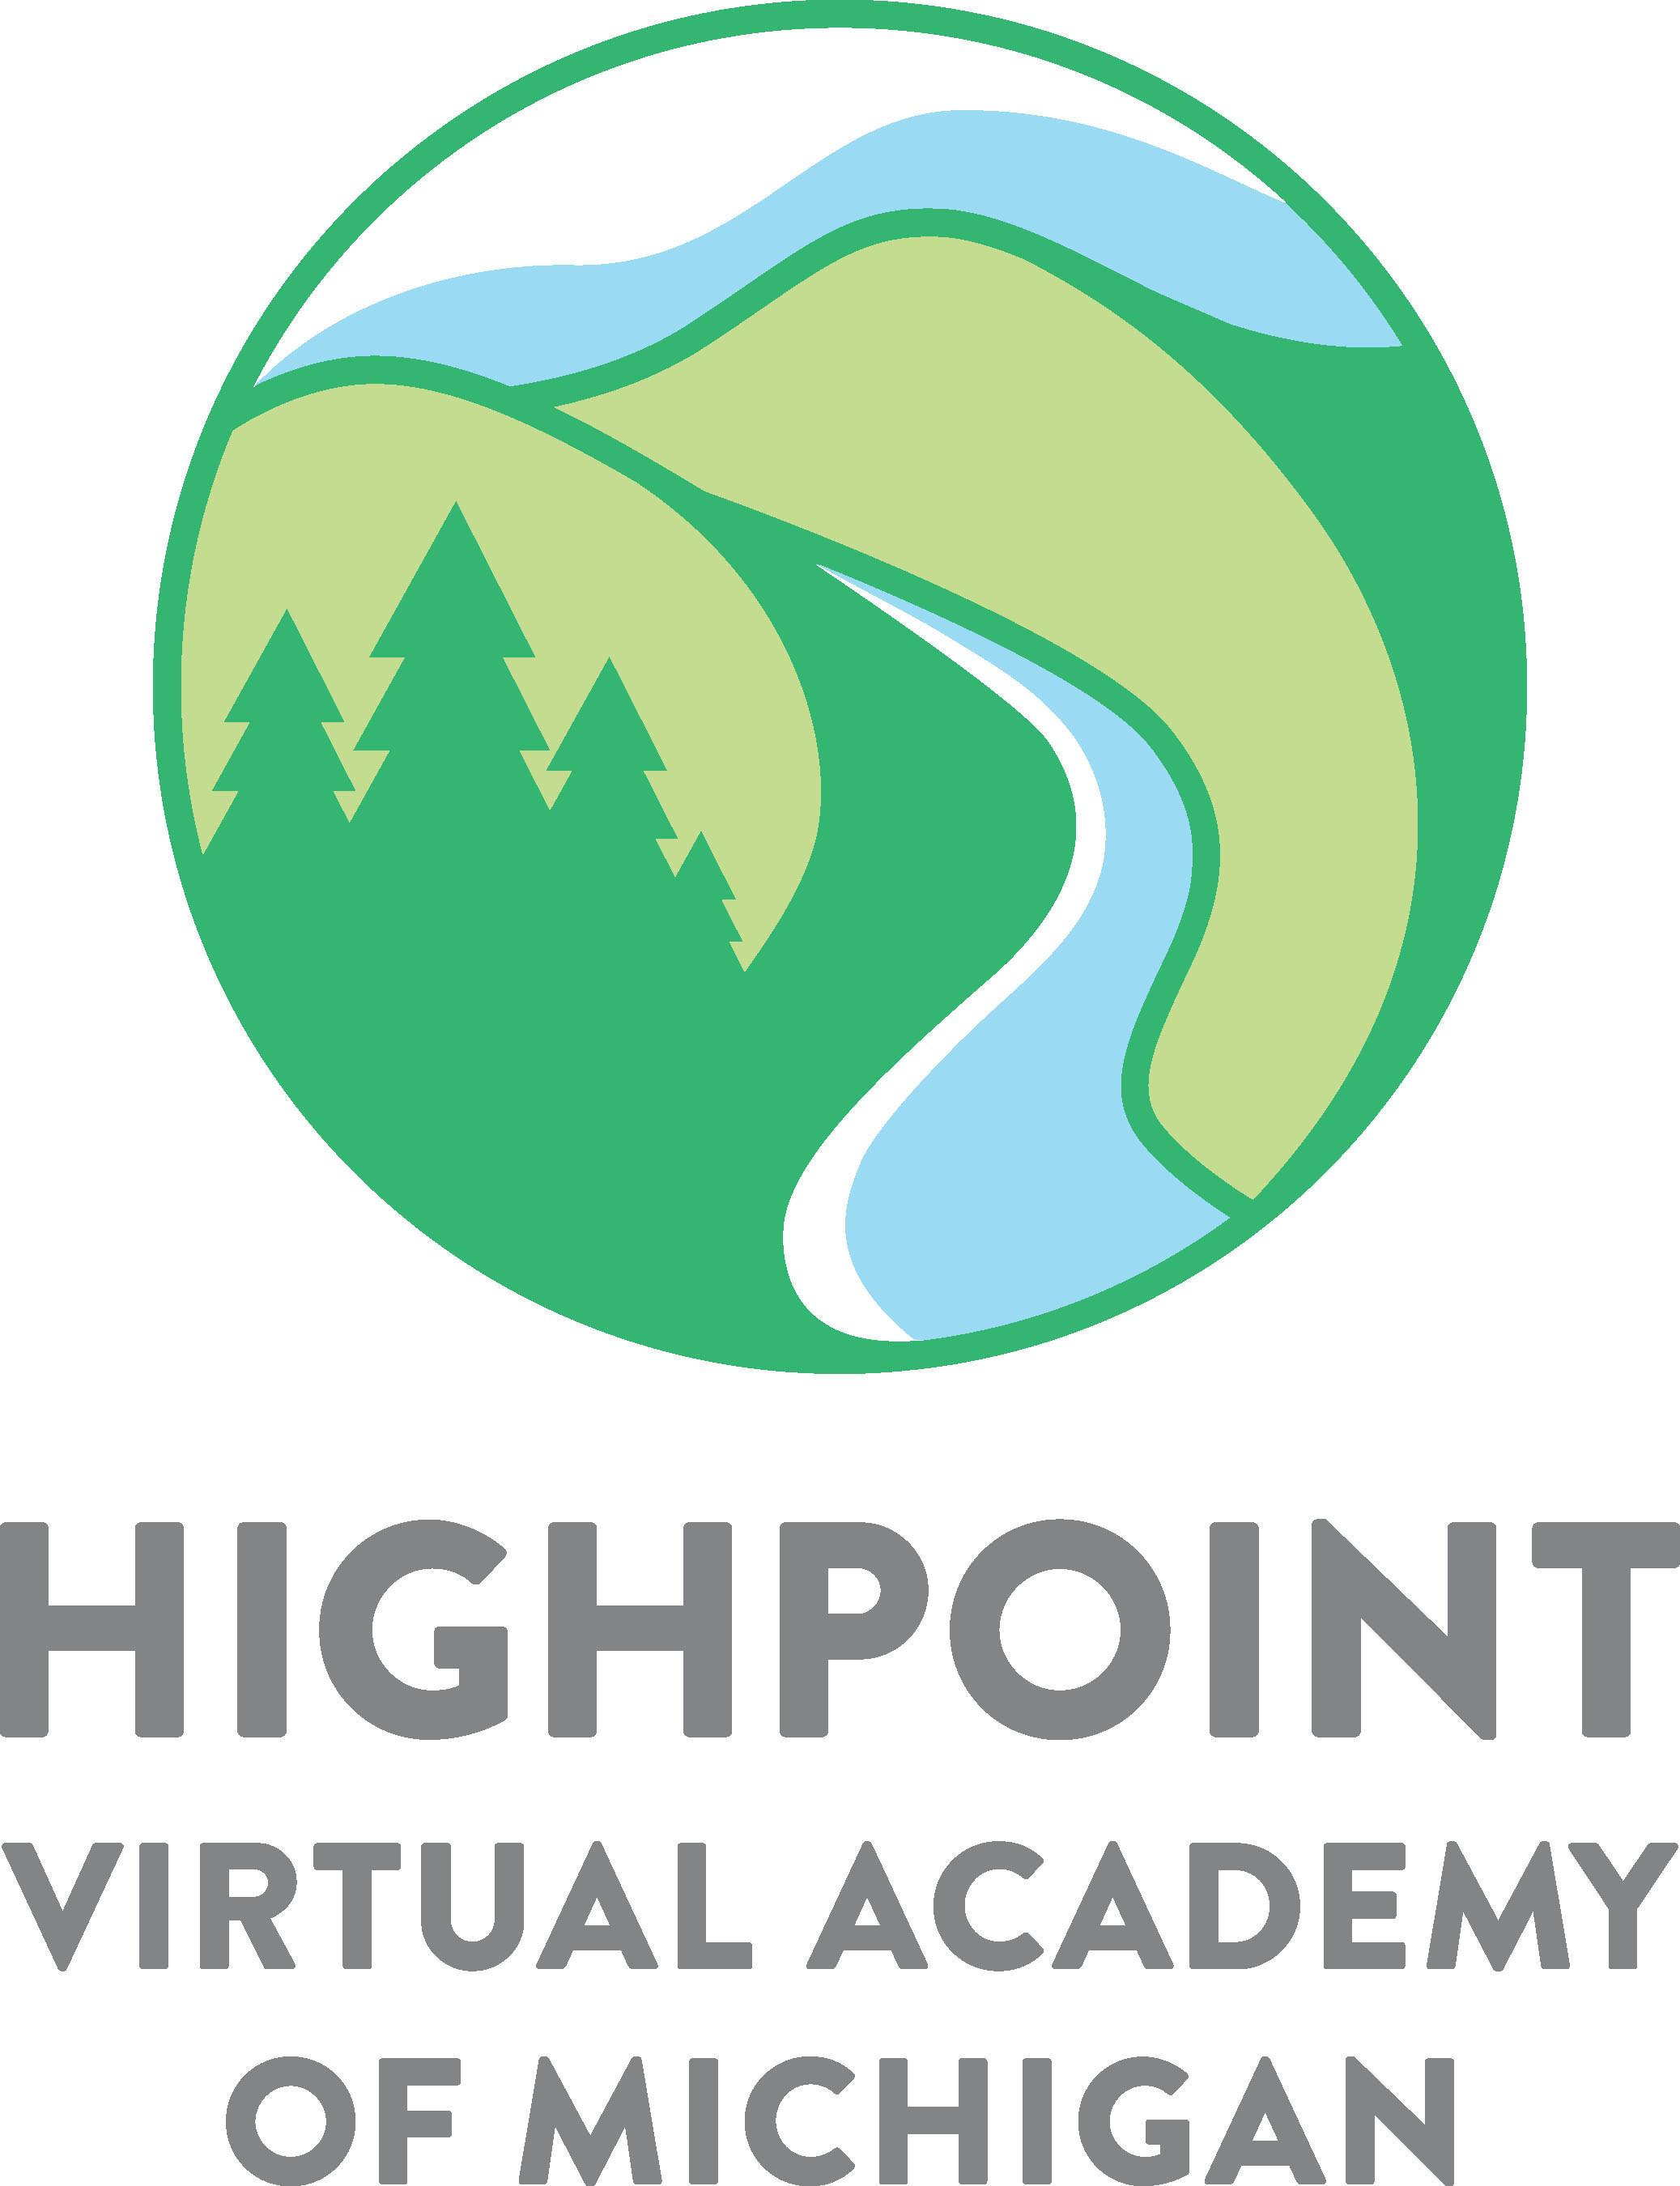 Highpoint Virtual Academy of Michigan